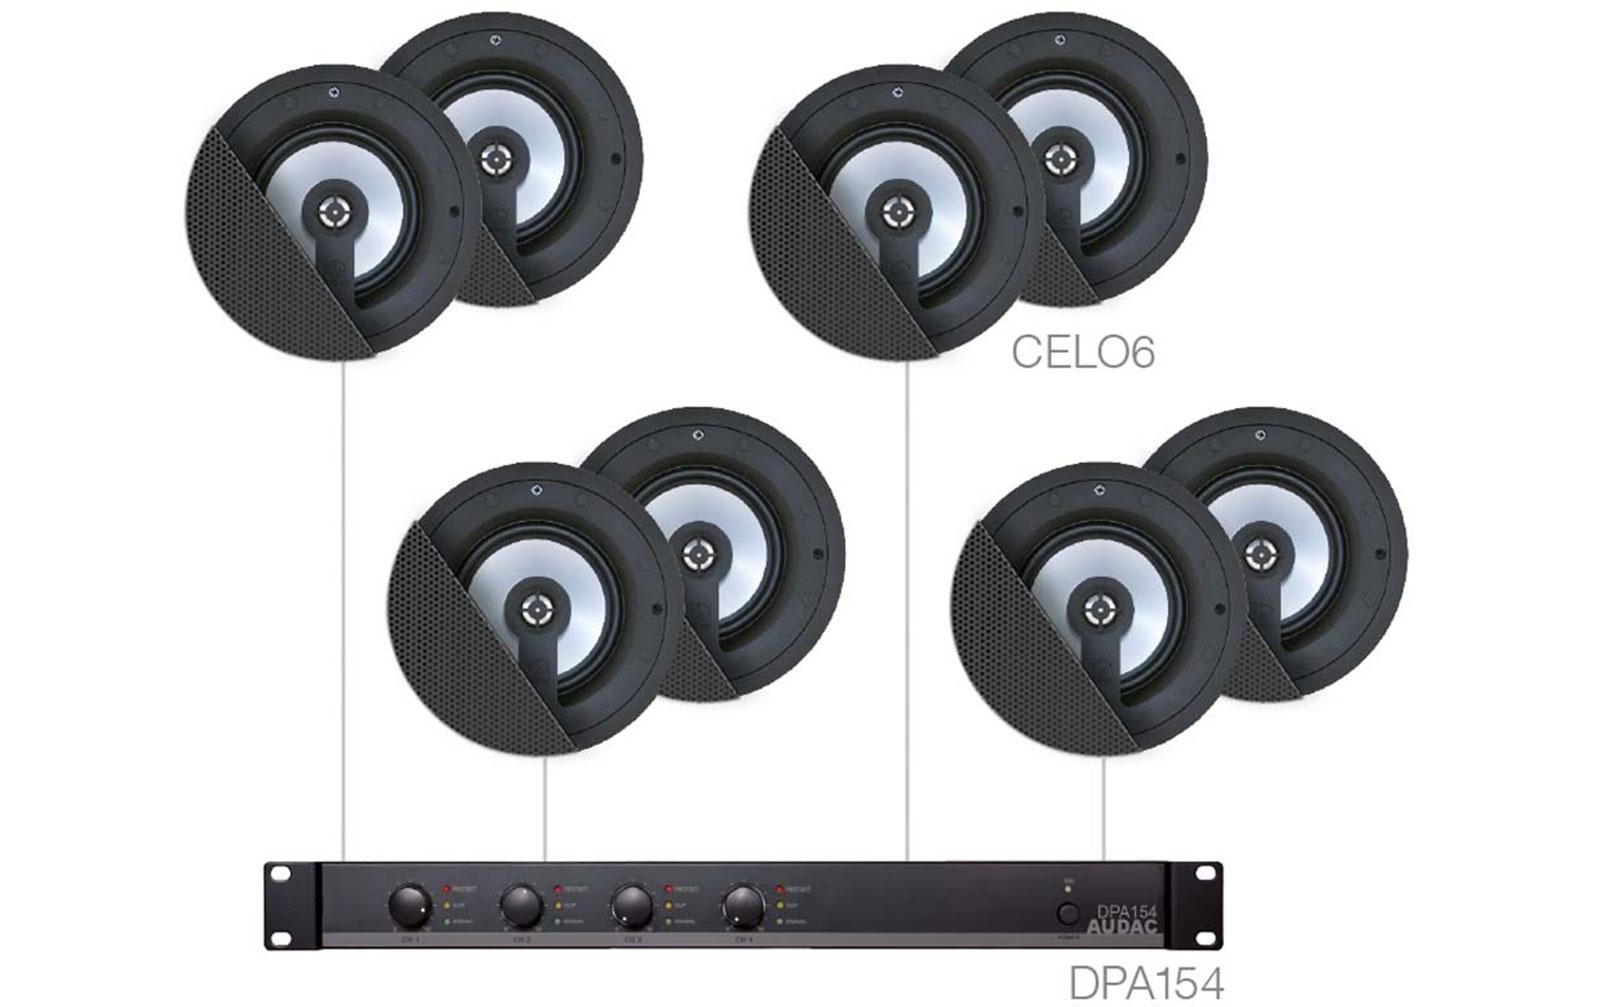 audac-senso-68-b-lautsprecher-set-8-x-celo6-dpa154-schwarz